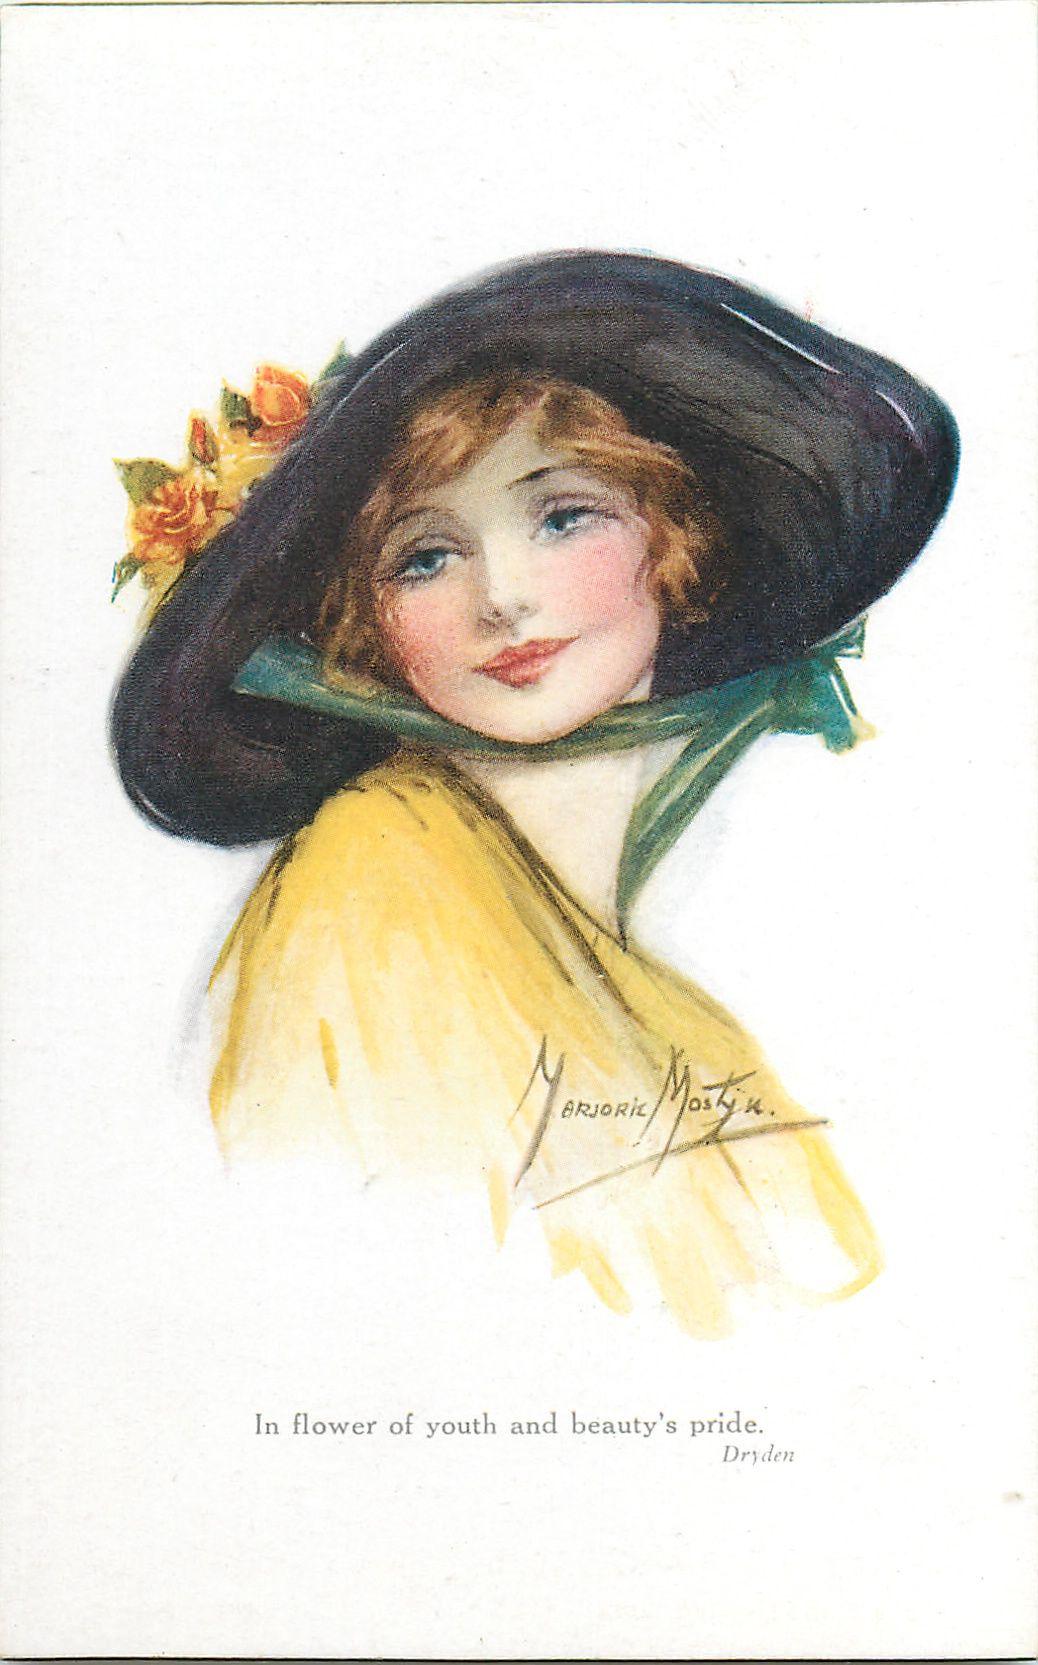 Woman In Yellow Dress Black Hat Faces Right Looks Back Over Her Shoulder Vintage Illustration Vintage Art Colorful Portrait